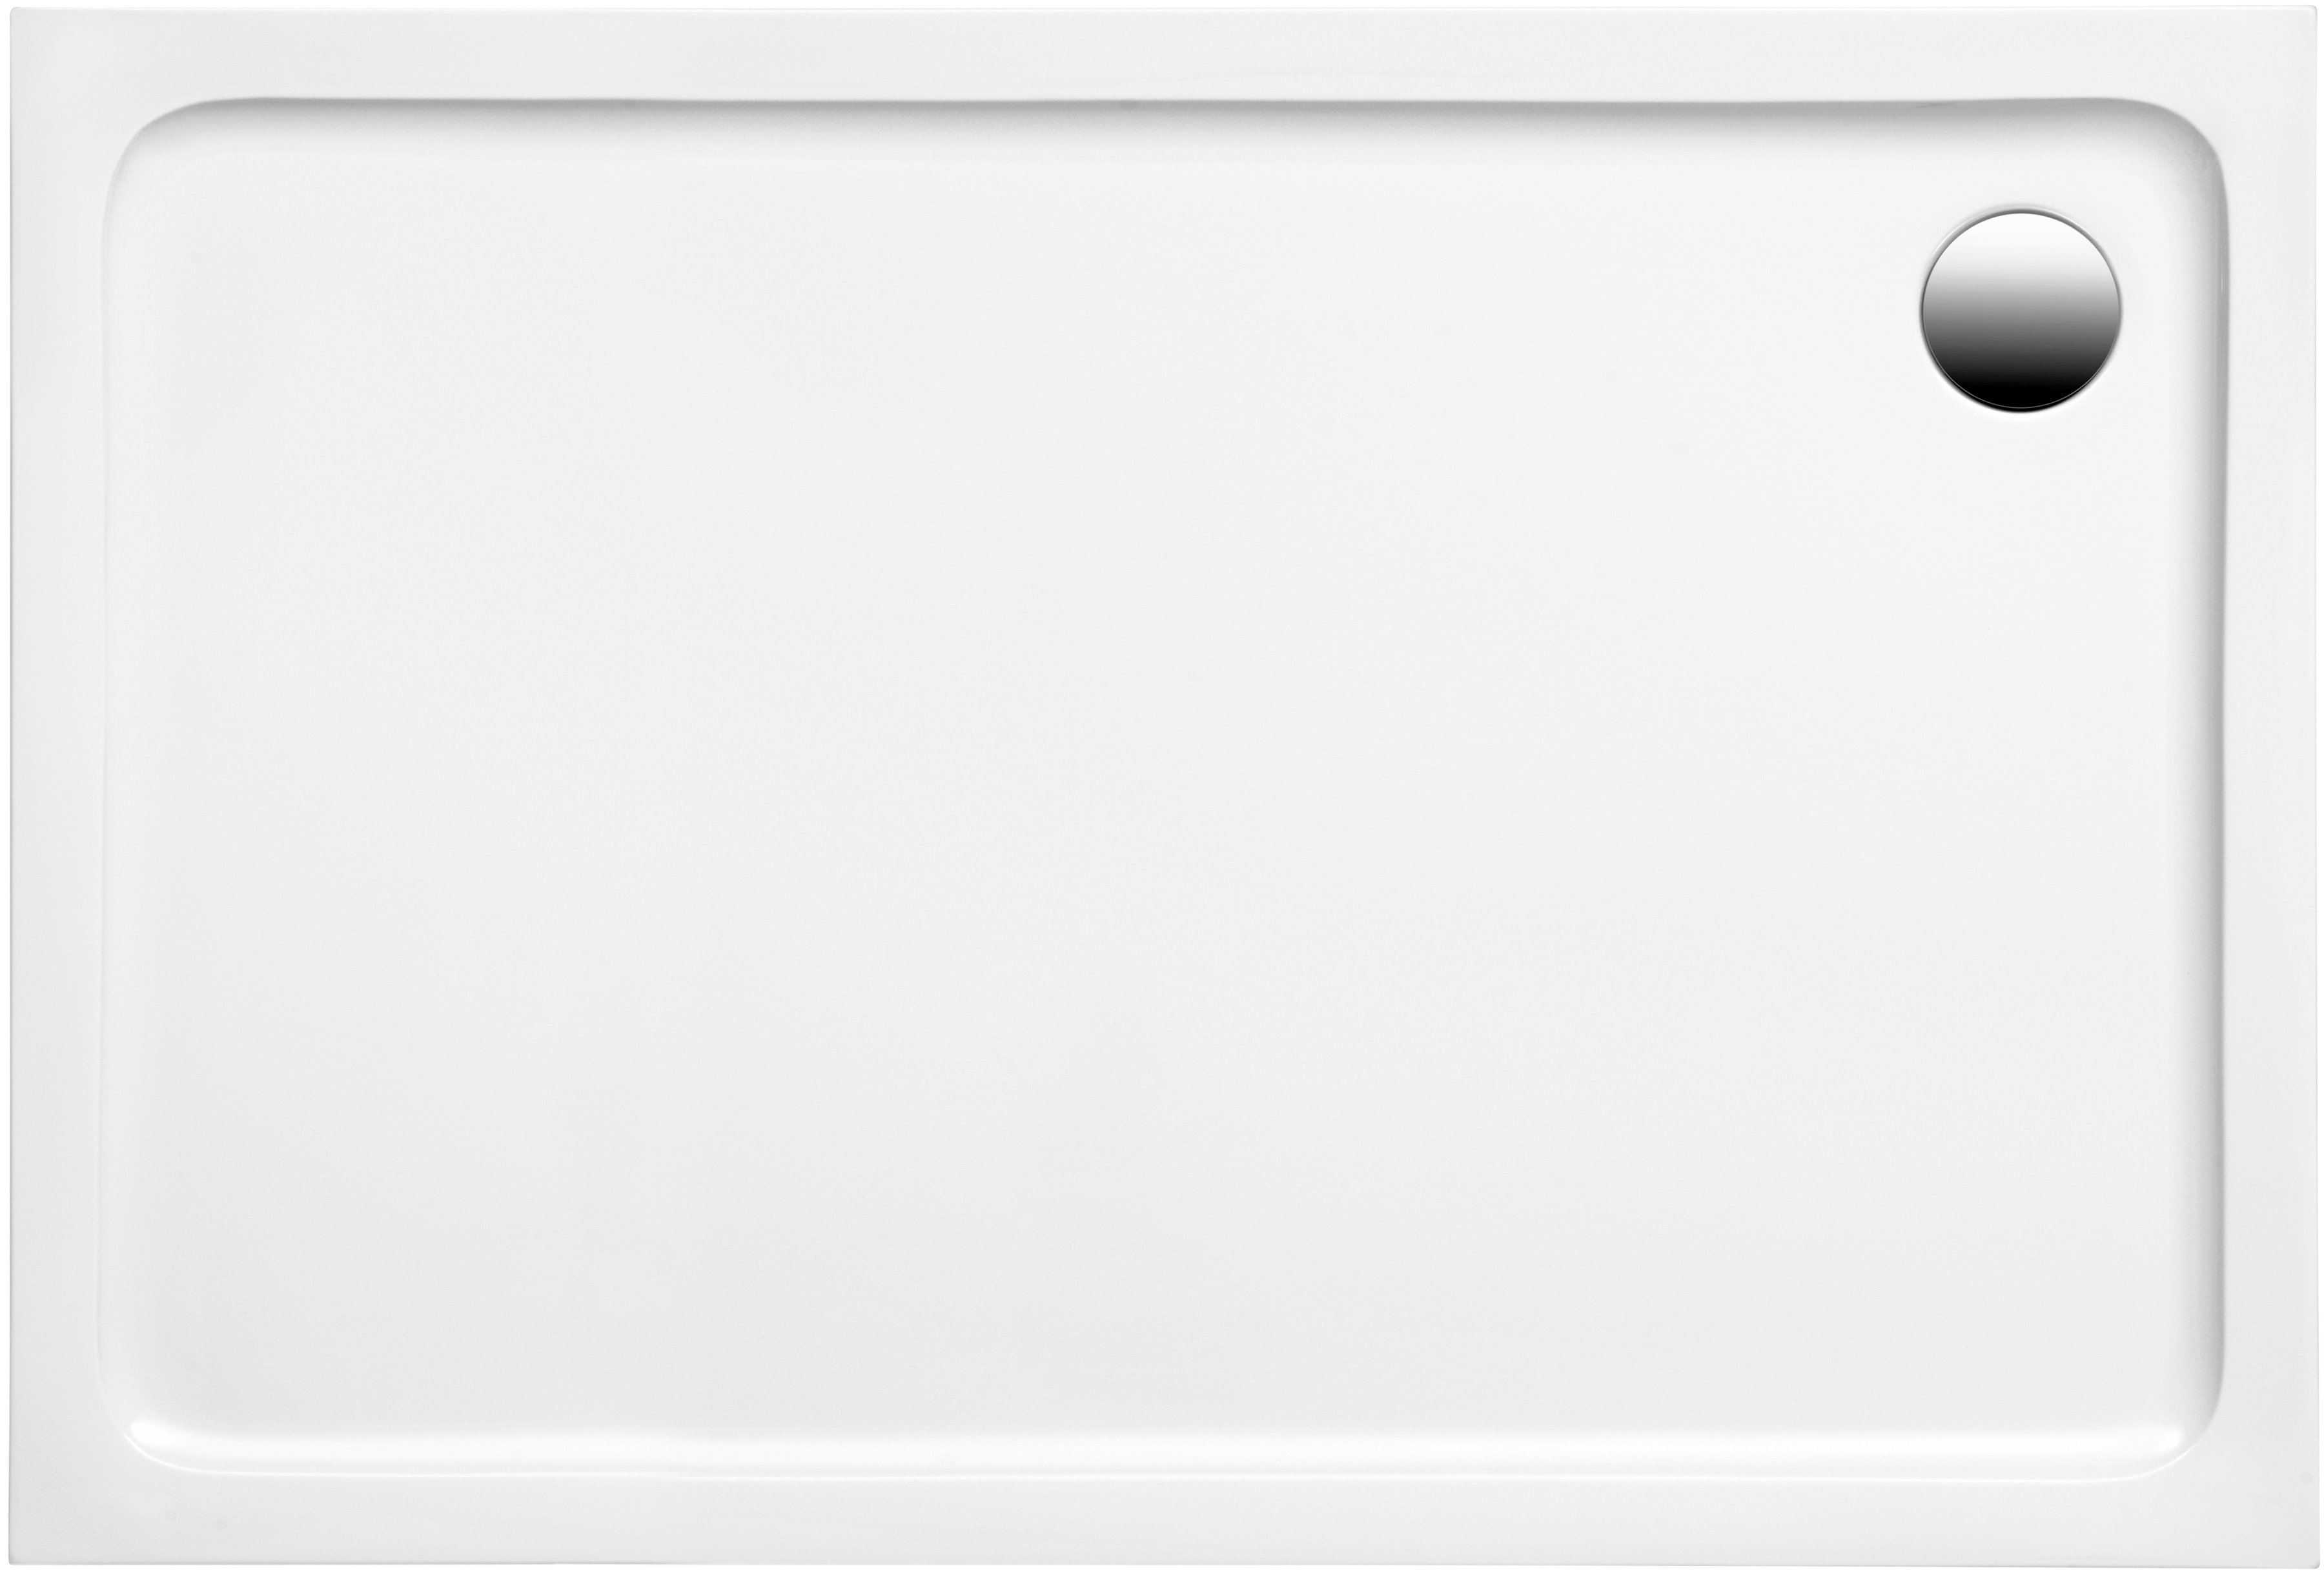 OTTOFOND Duschwanne Set Rechteckduschwanne, 1000x900/30 mm weiß Duschwannen Duschen Bad Sanitär